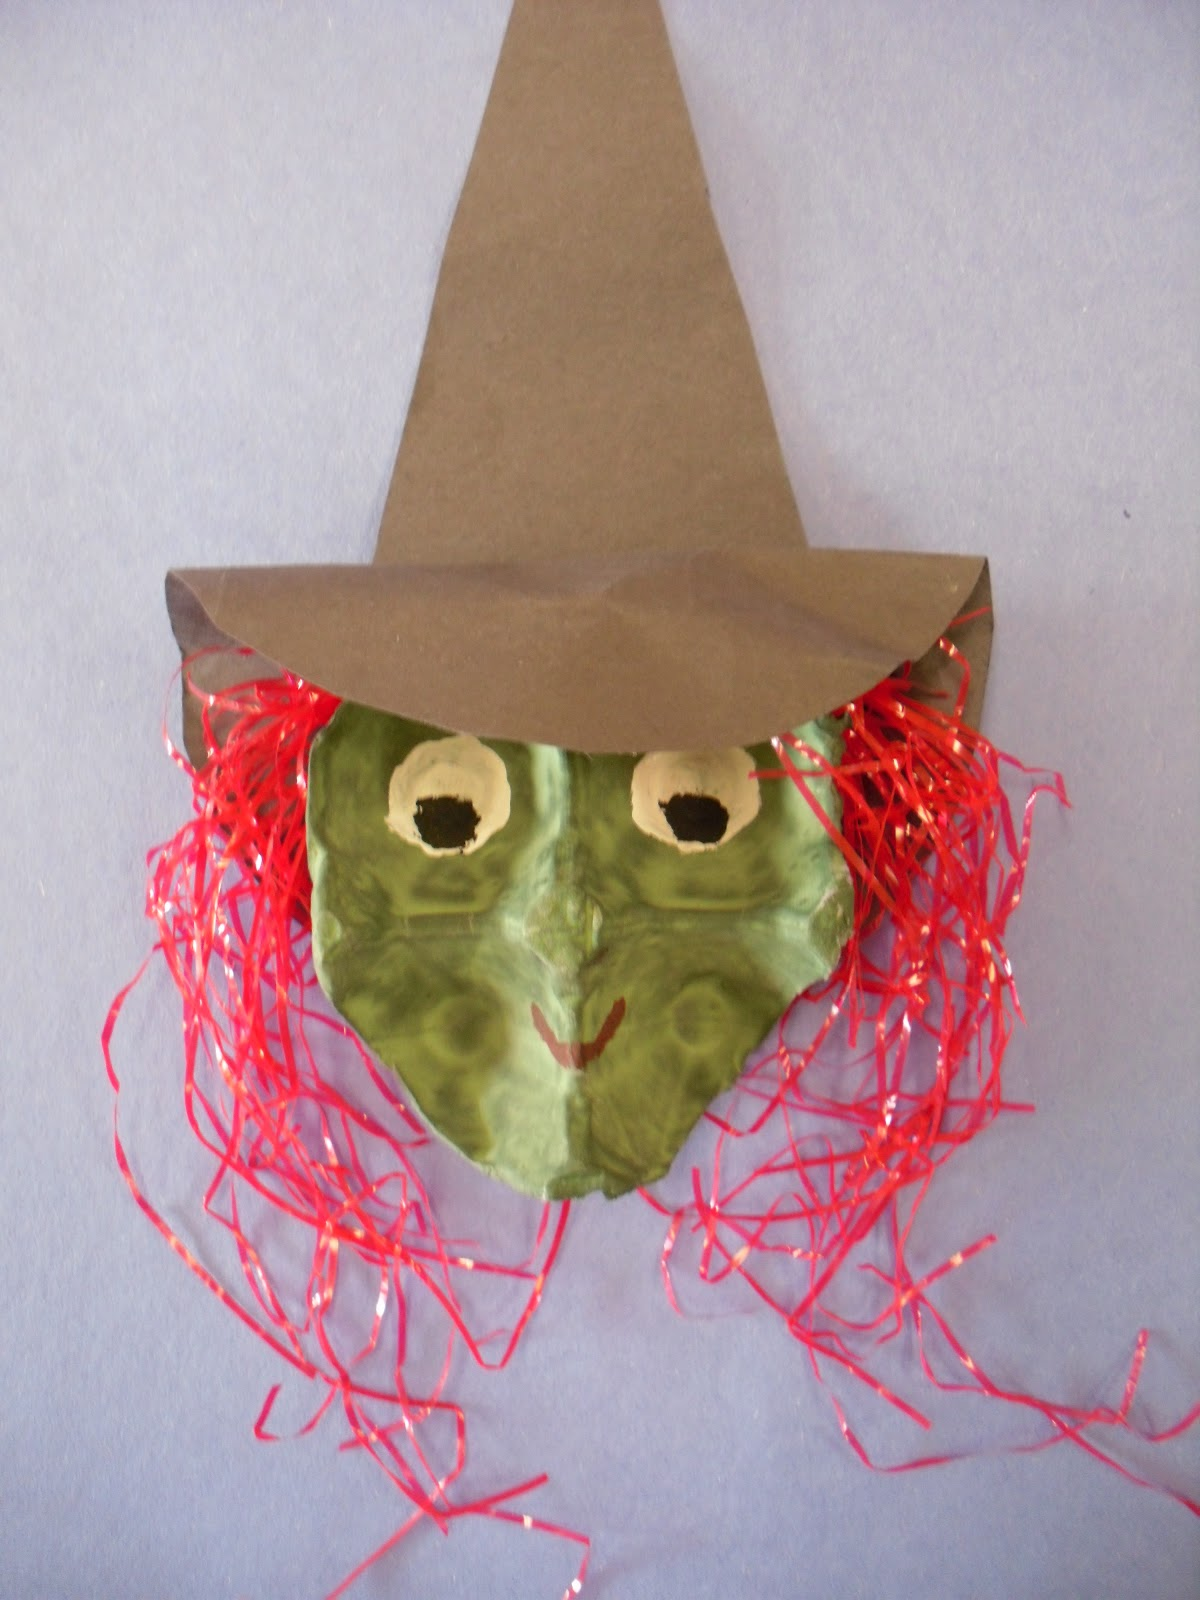 going green for halloween - Halloween Cartons